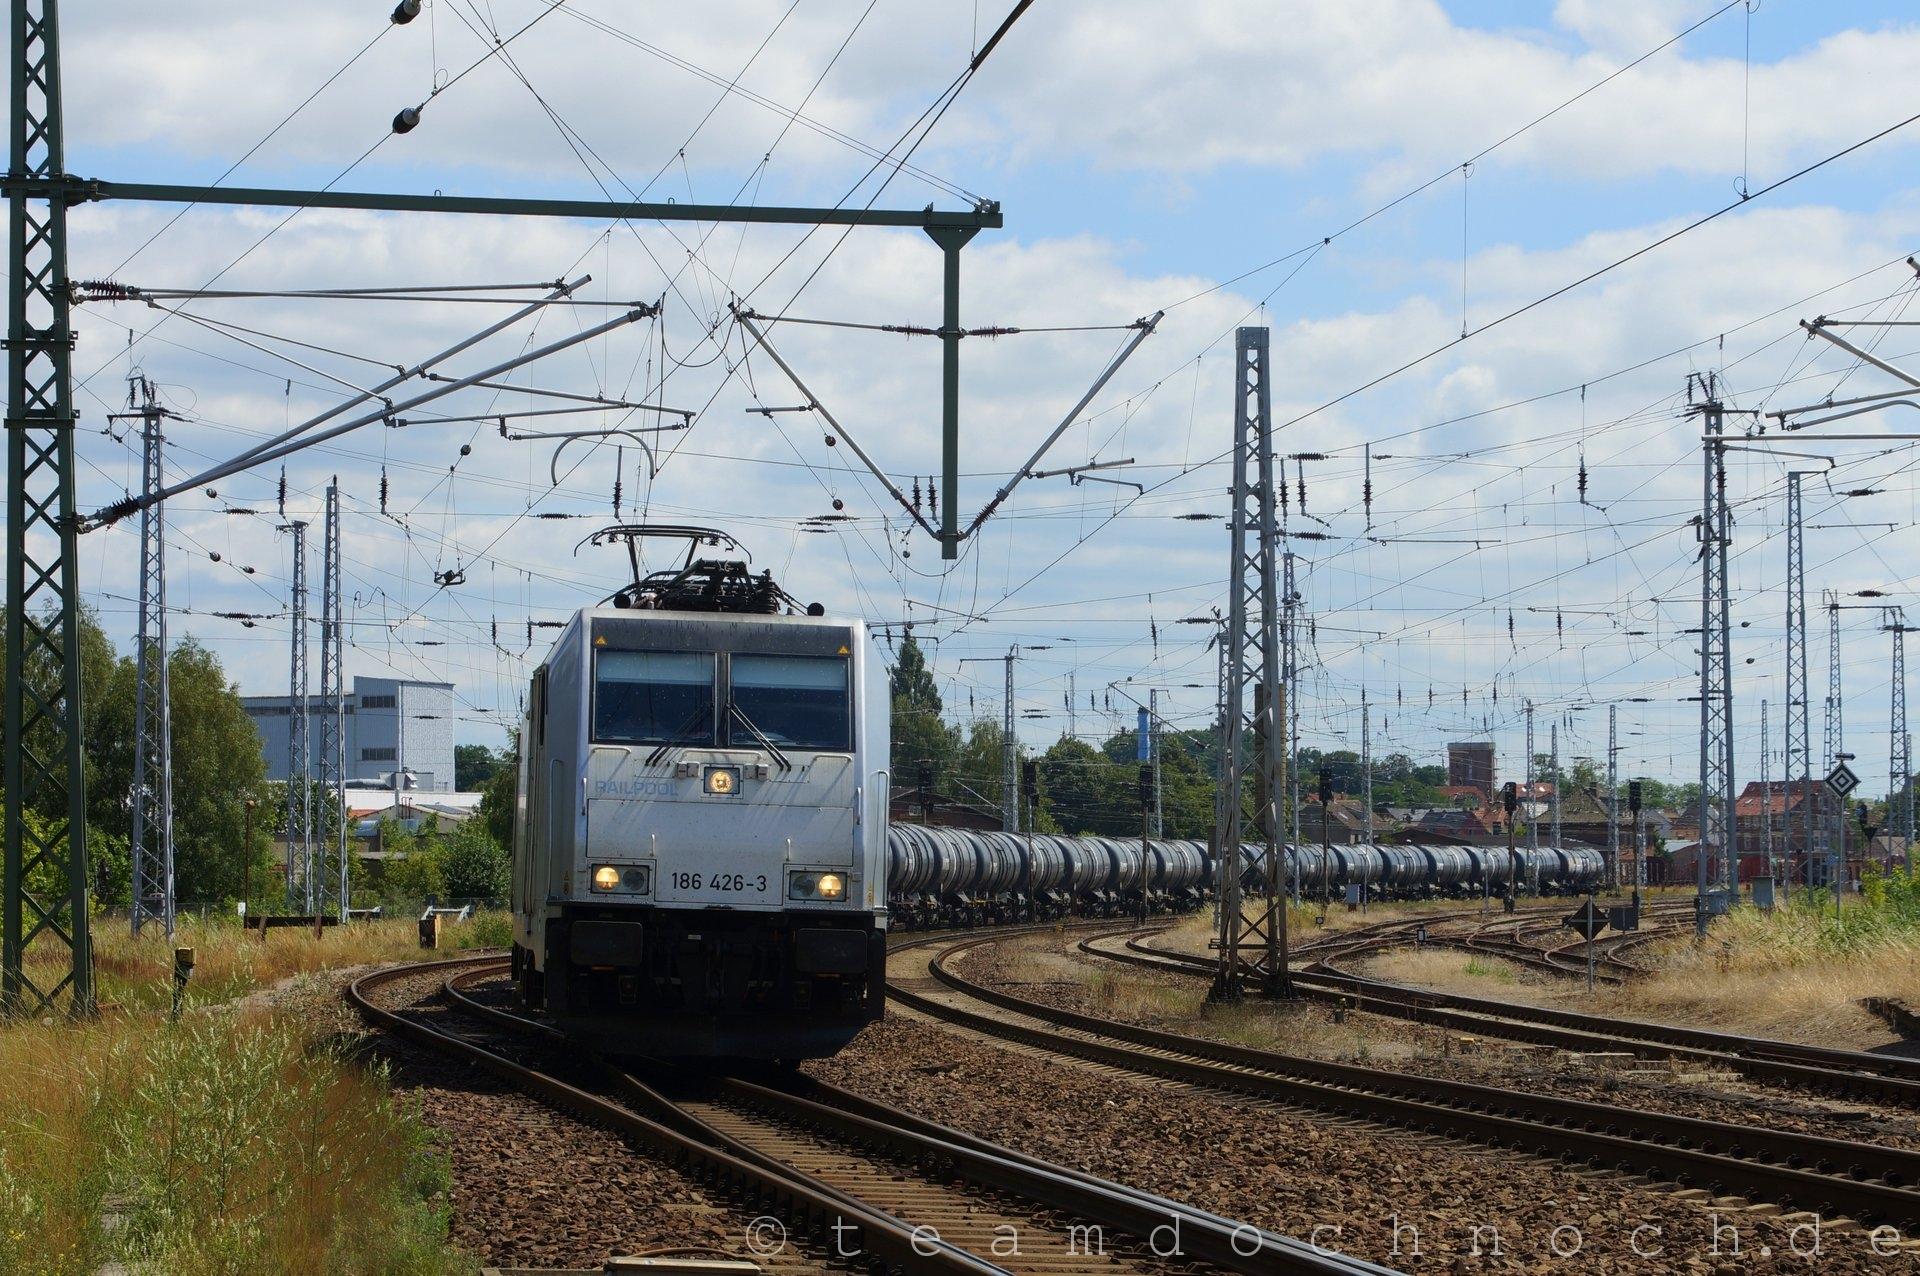 186 426-3 Railpool bei Ausfahrt aus dem Bahnhof Waren